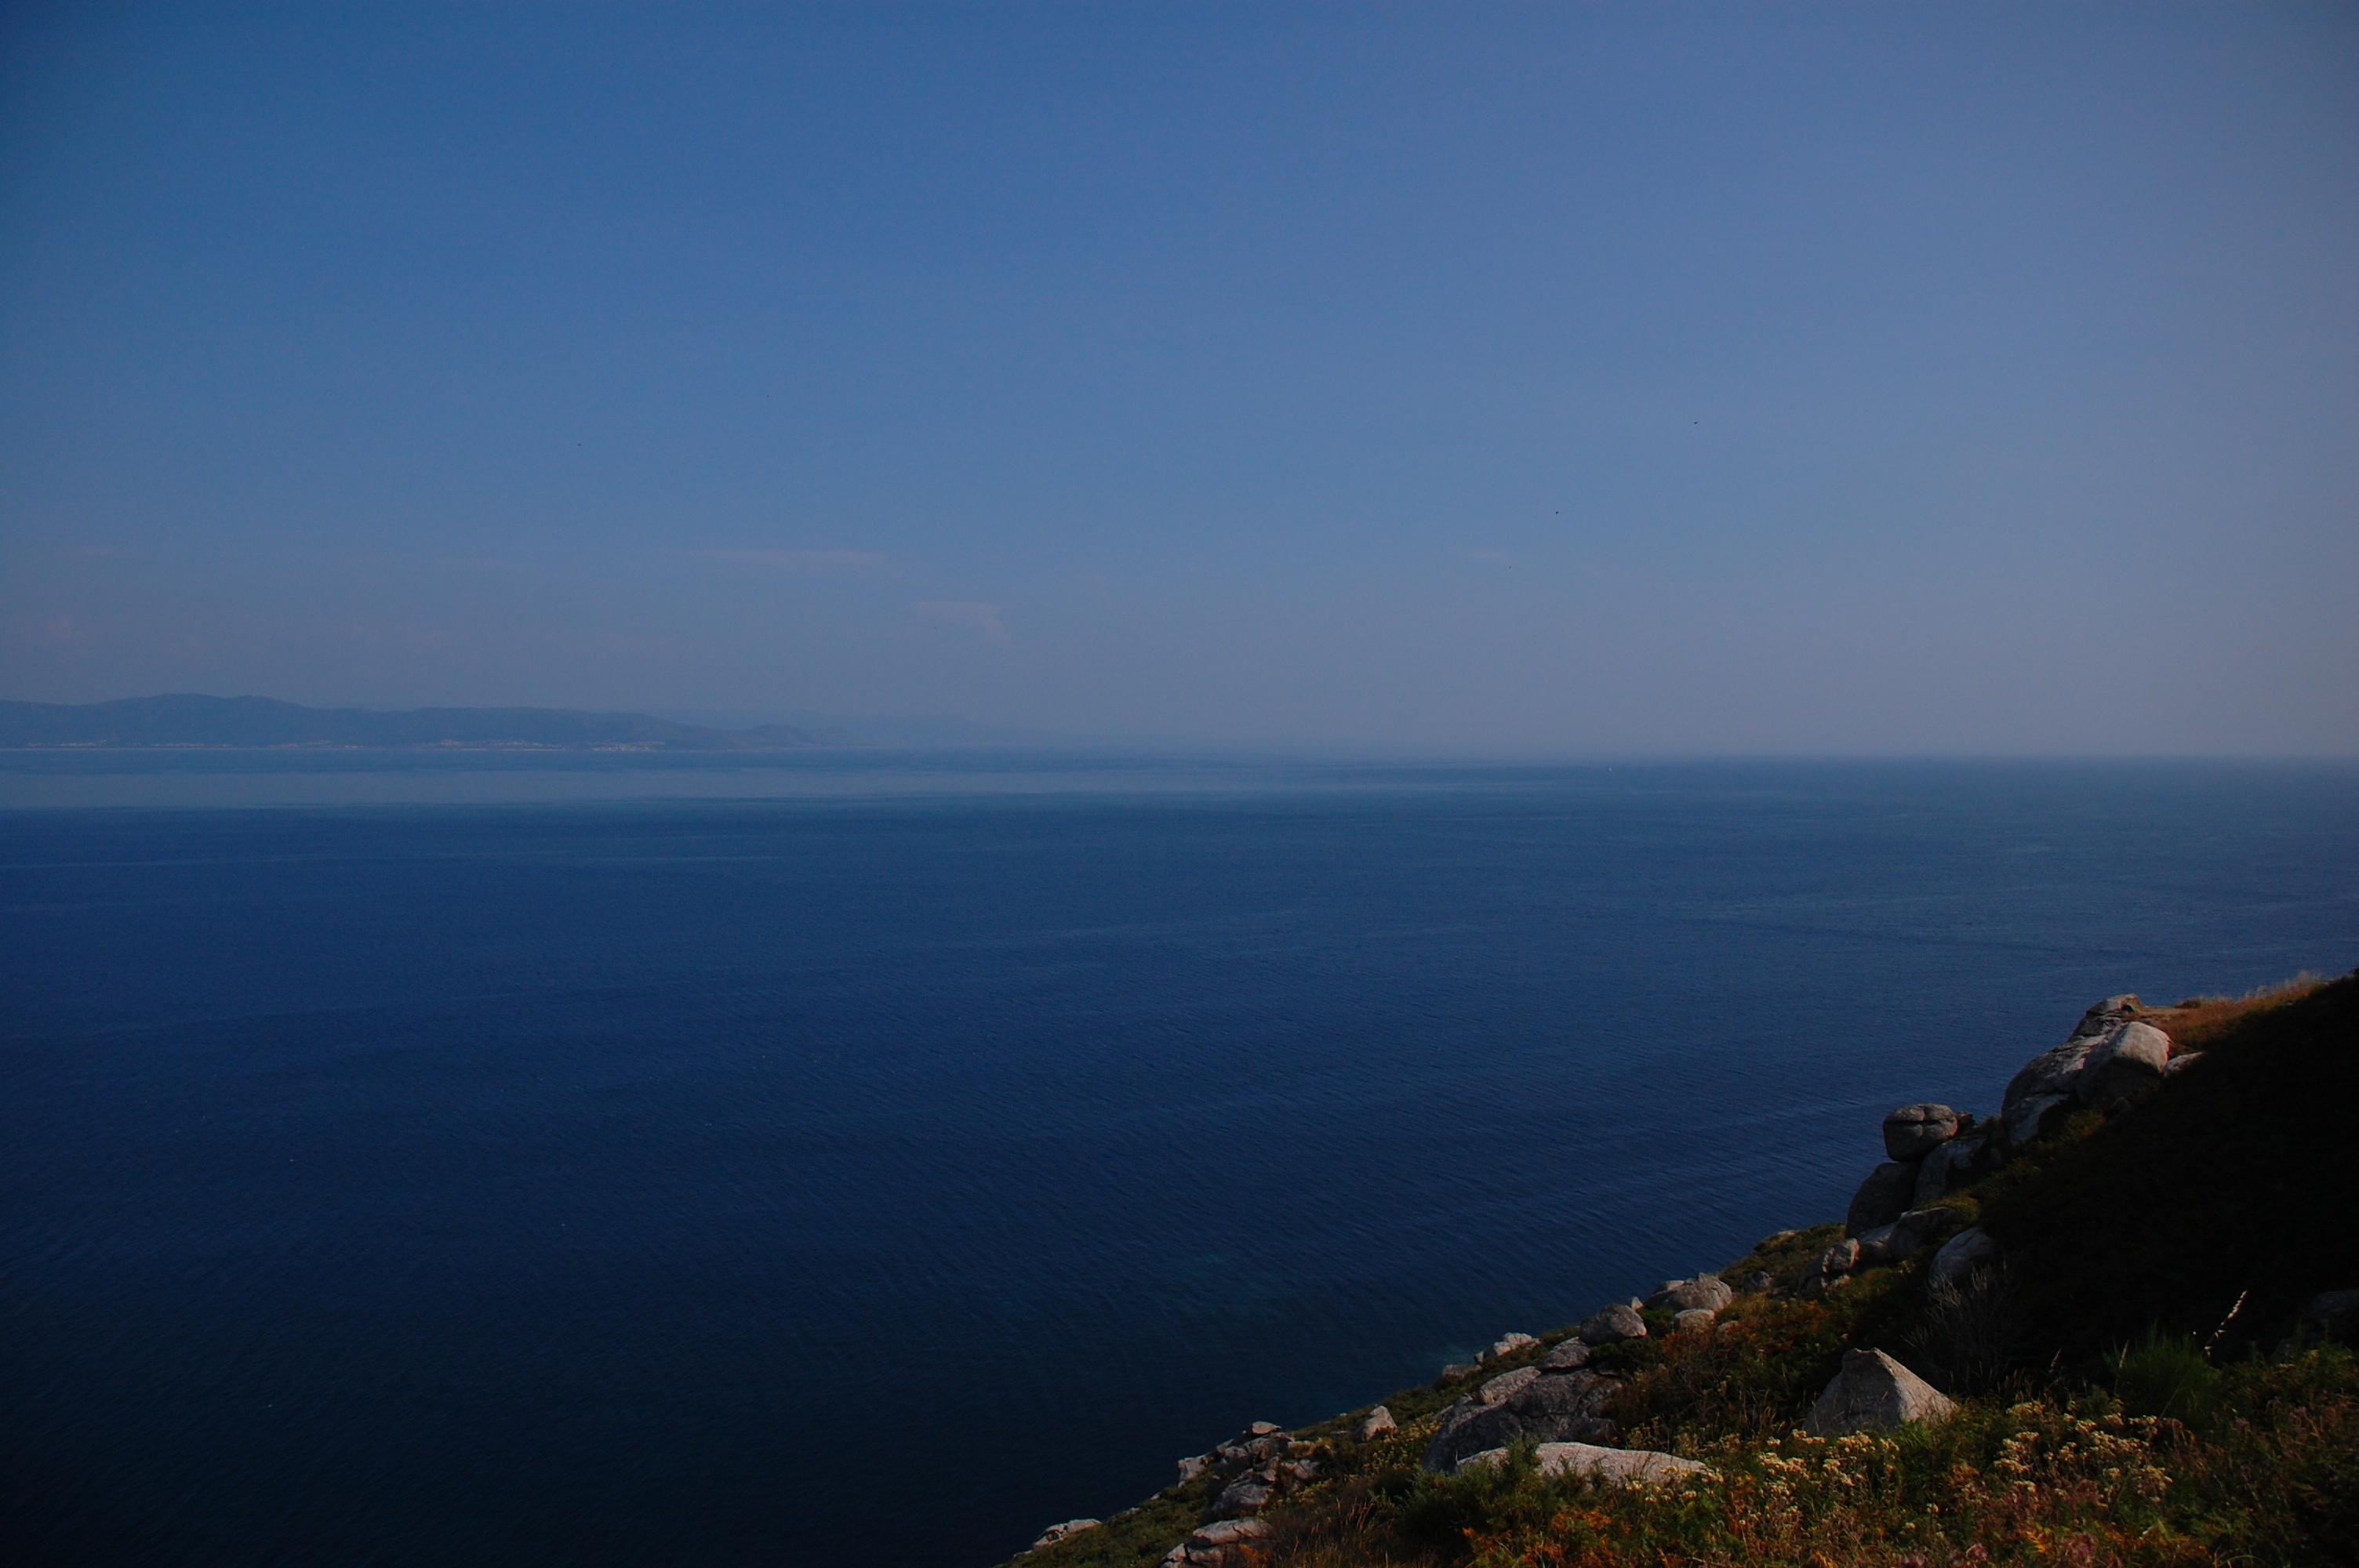 File:Cabo Fisterra Fin do Camiño 14VII2013 1.JPG - Wikimedia Commons